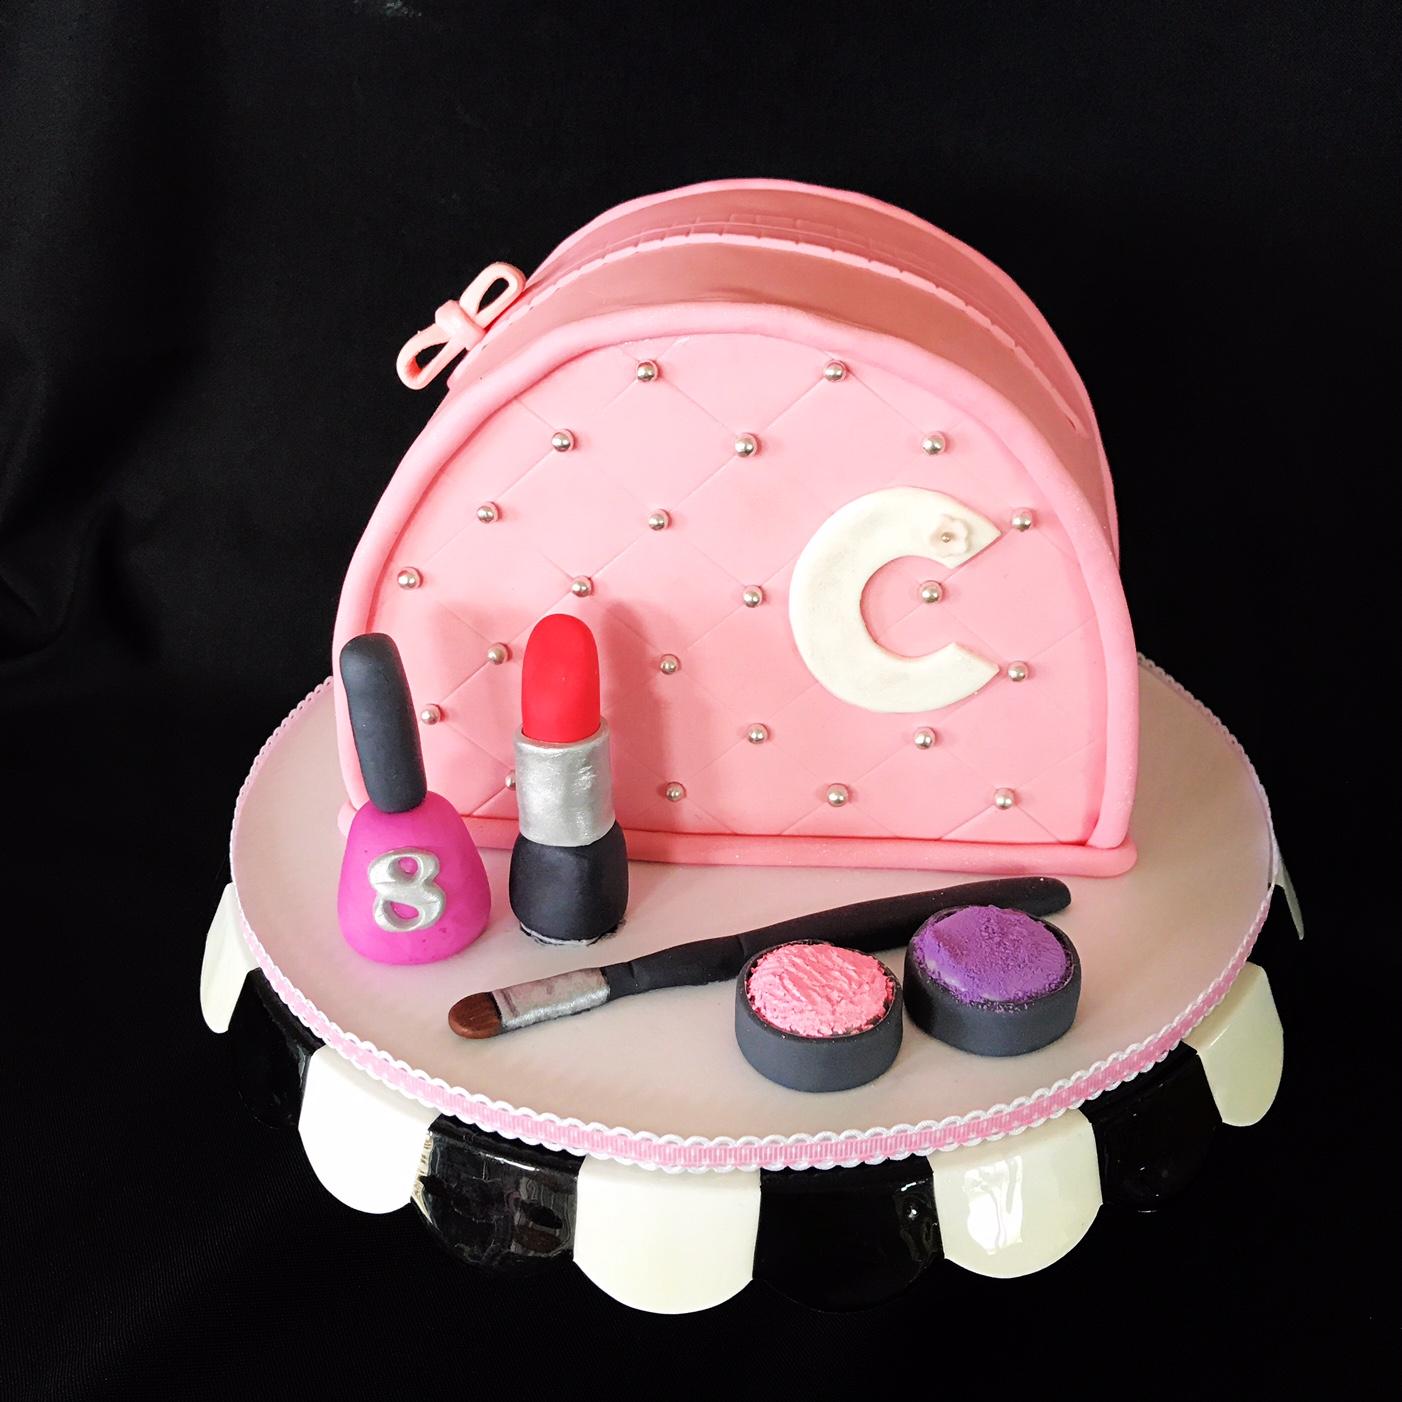 Kids celebration cake